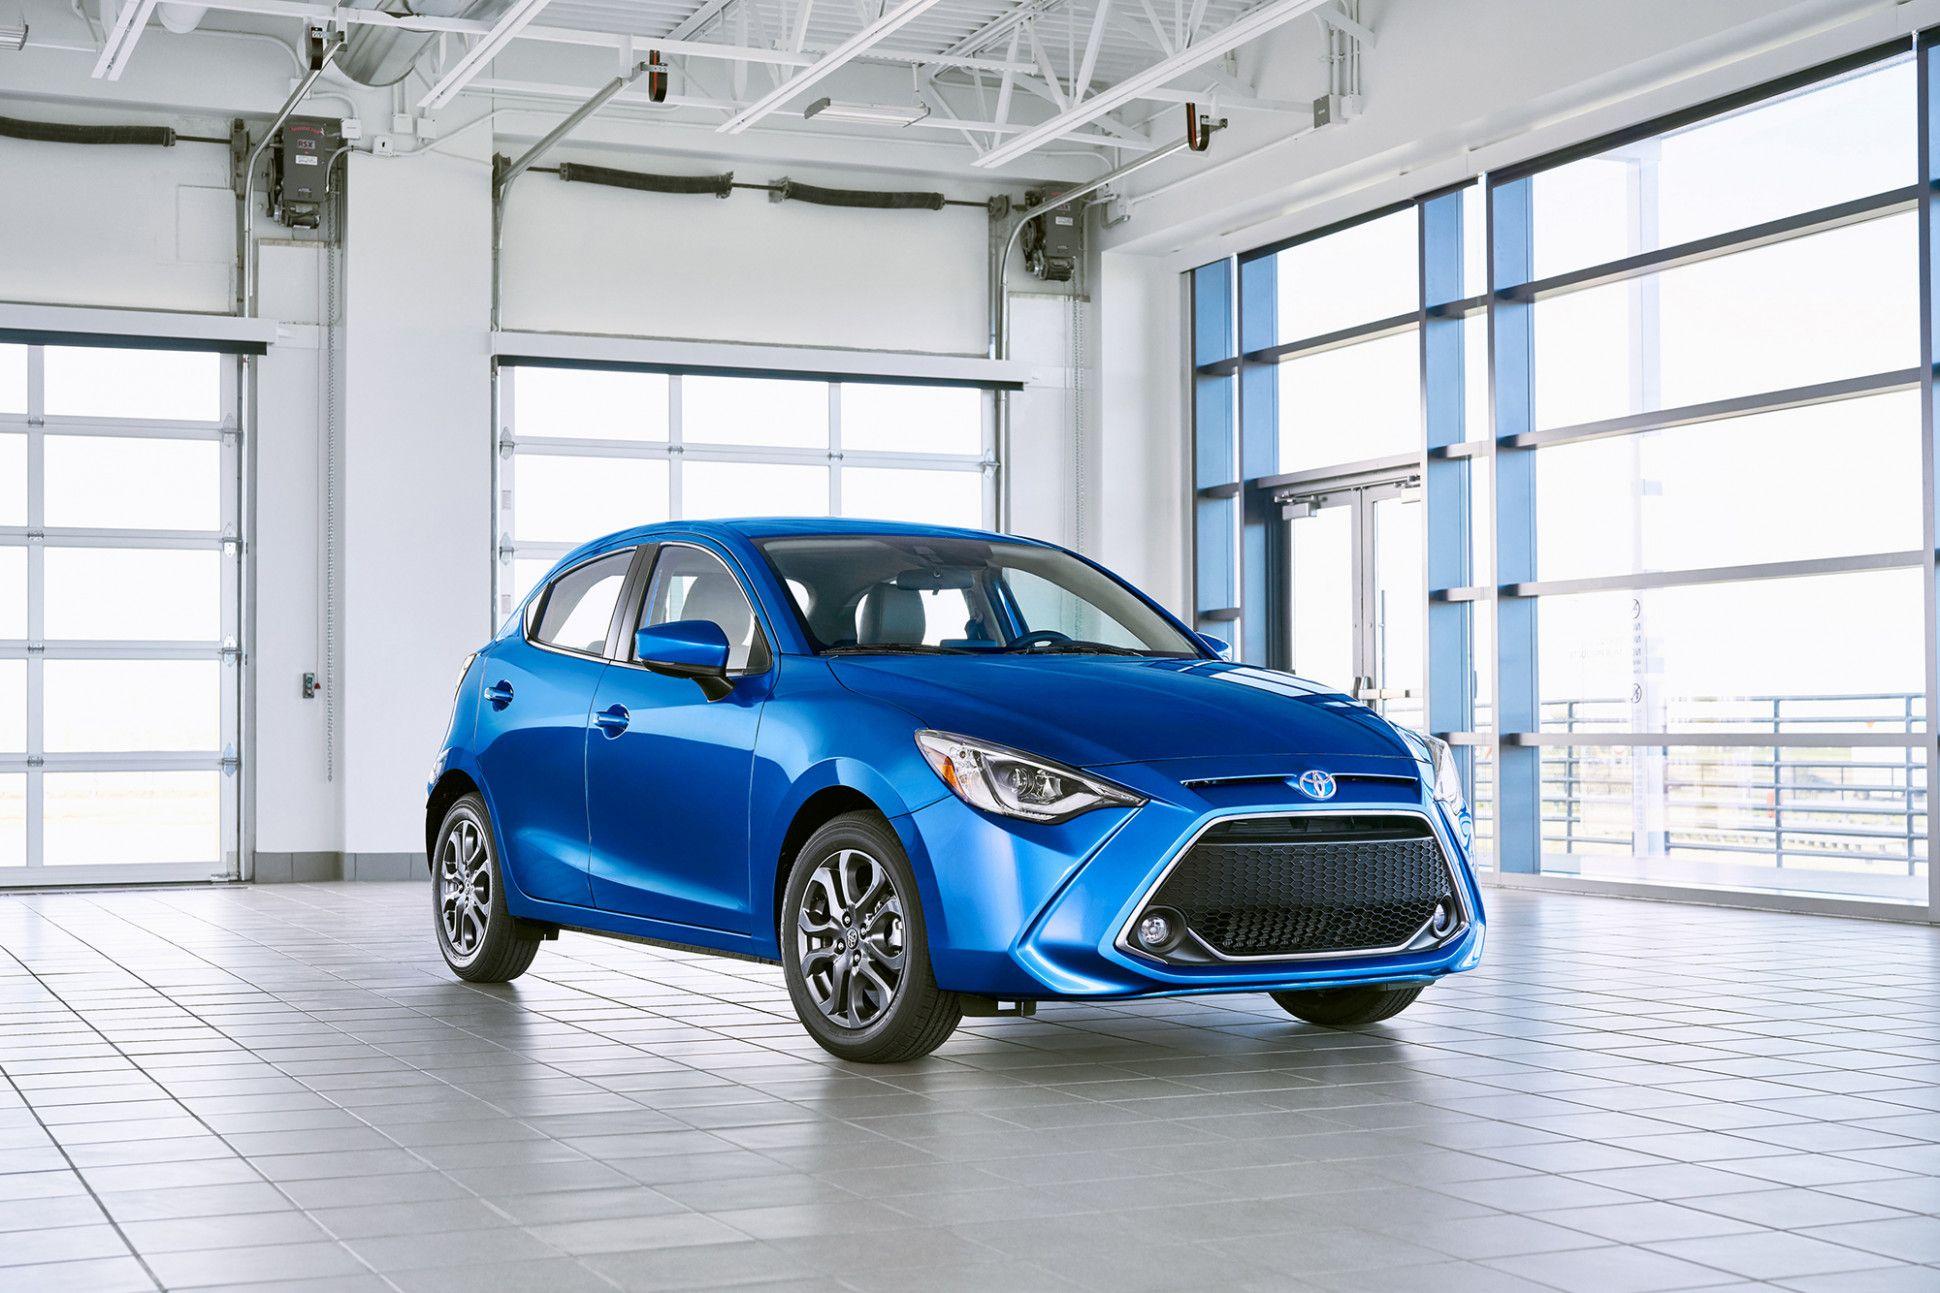 Yaris 2020 Mazda 2 Redesign Di 2020 Hatchback Toyota New York